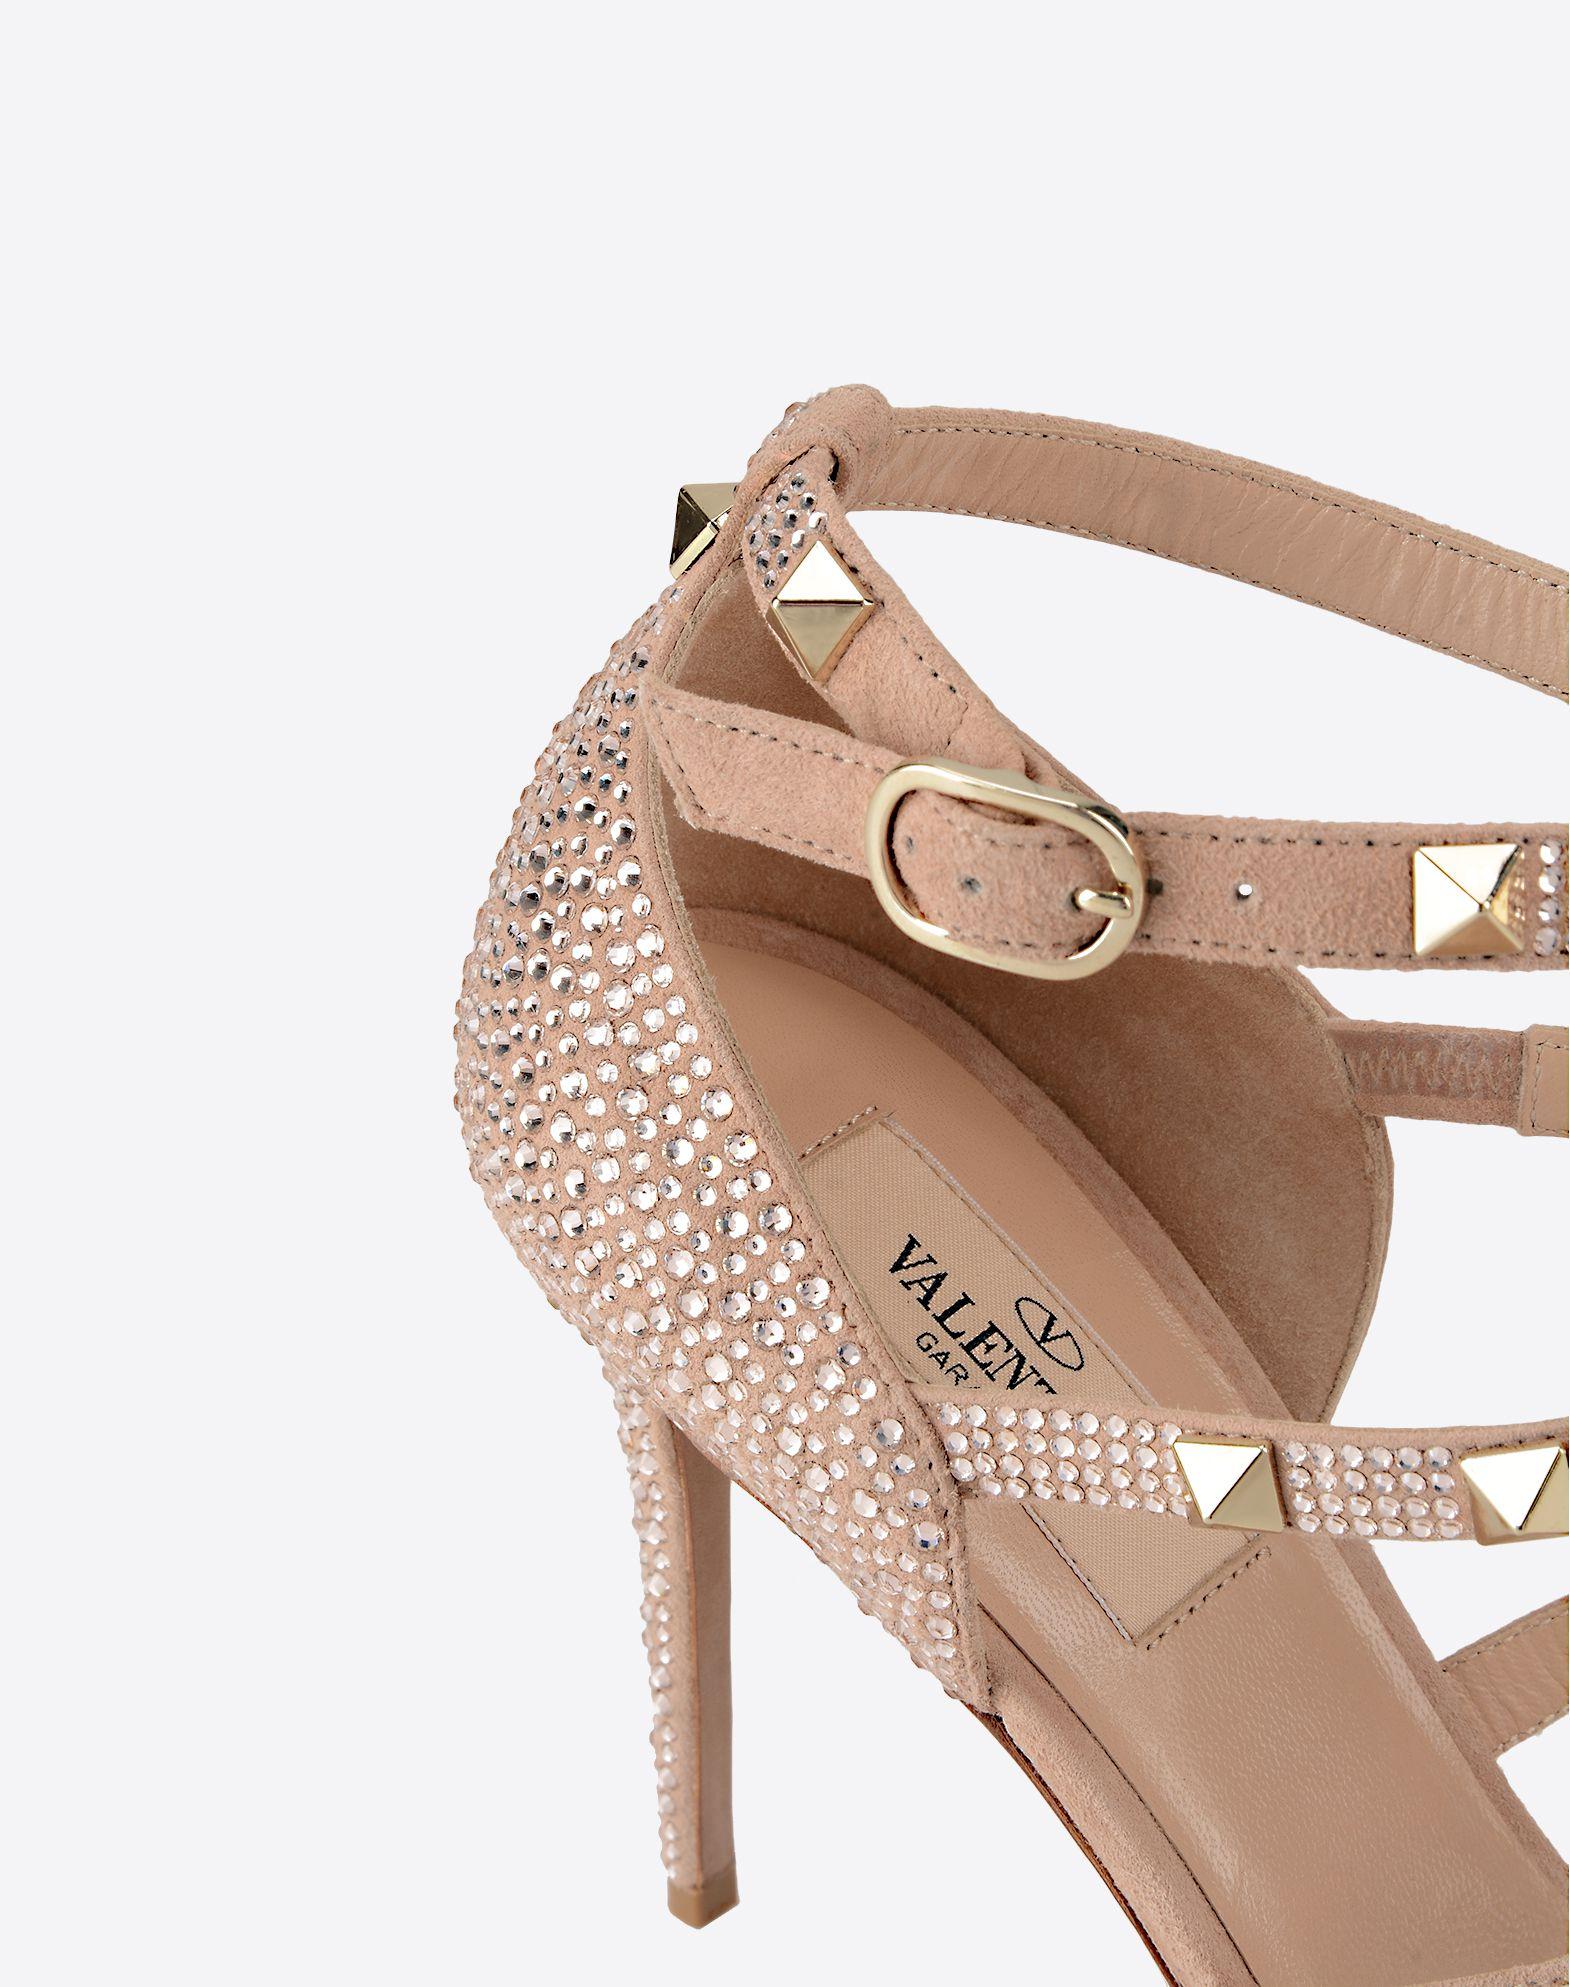 VALENTINO GARAVANI Rockstud sandal with crystals Sandal D a